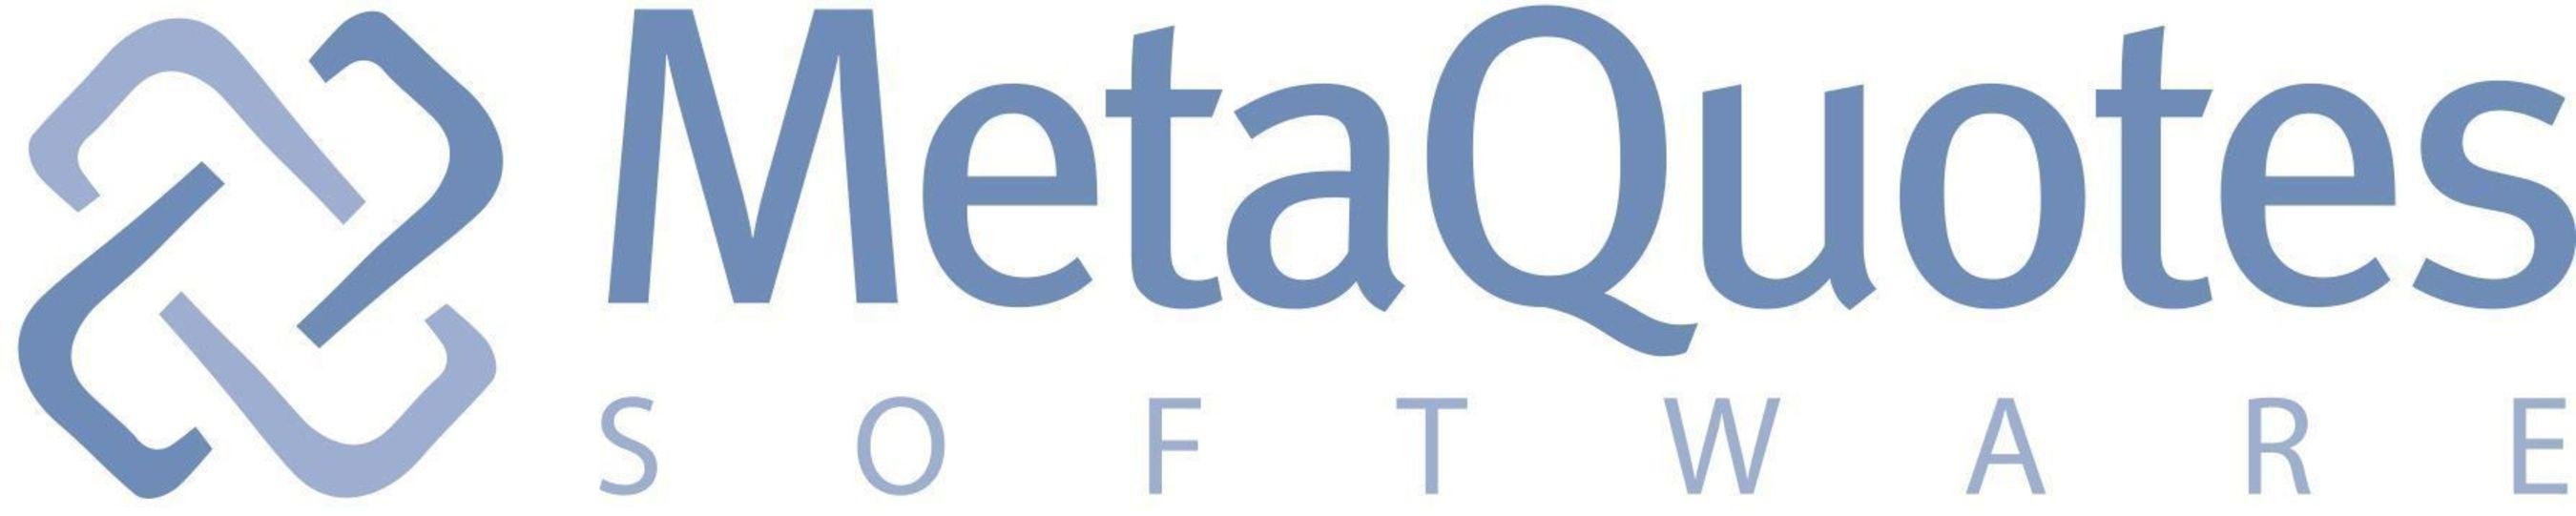 MetaQuotes Software Logo (PRNewsFoto/MetaQuotes Software Corp.)